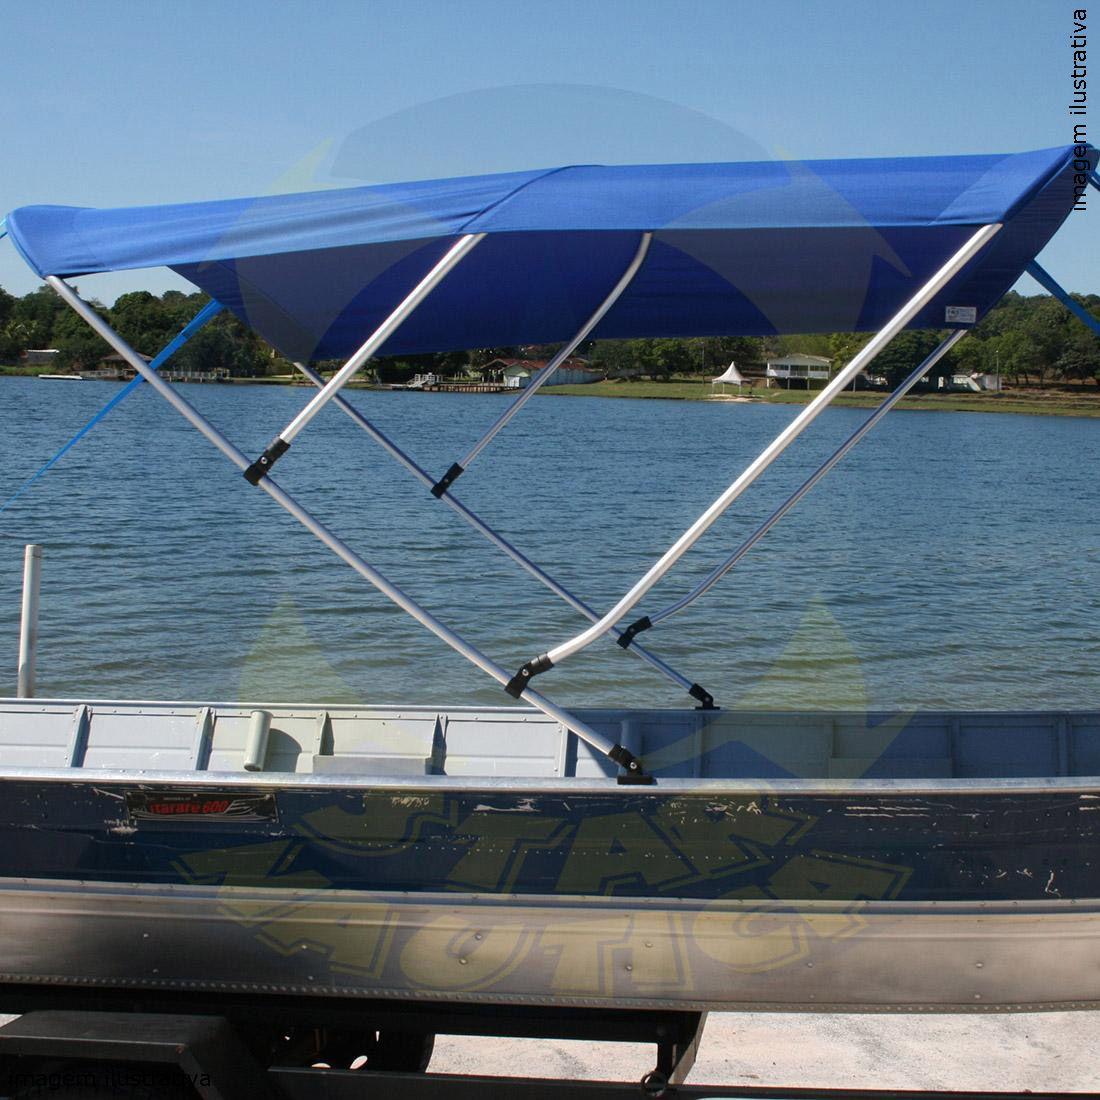 Capota Toldo Barco Big Fish 5016 Poliéster 3 Arcos Tubo 7/8